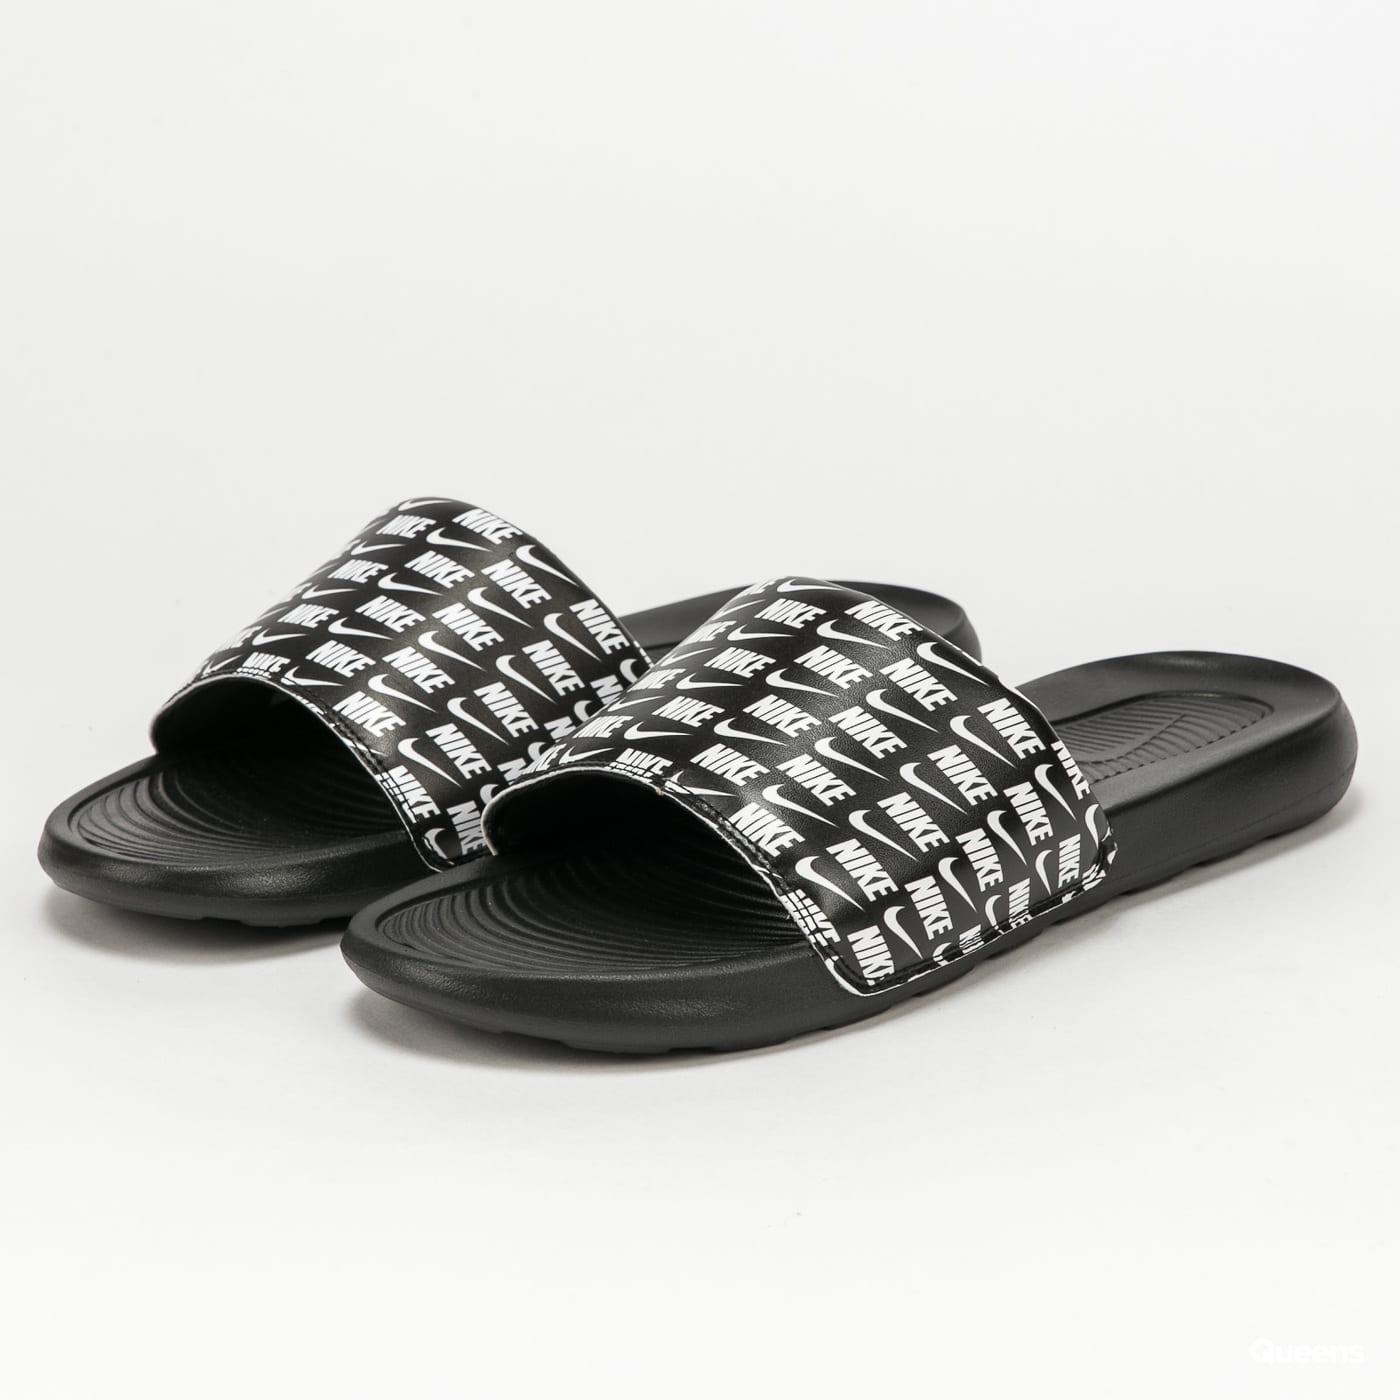 Nike Victori One Slide Print black / white - black